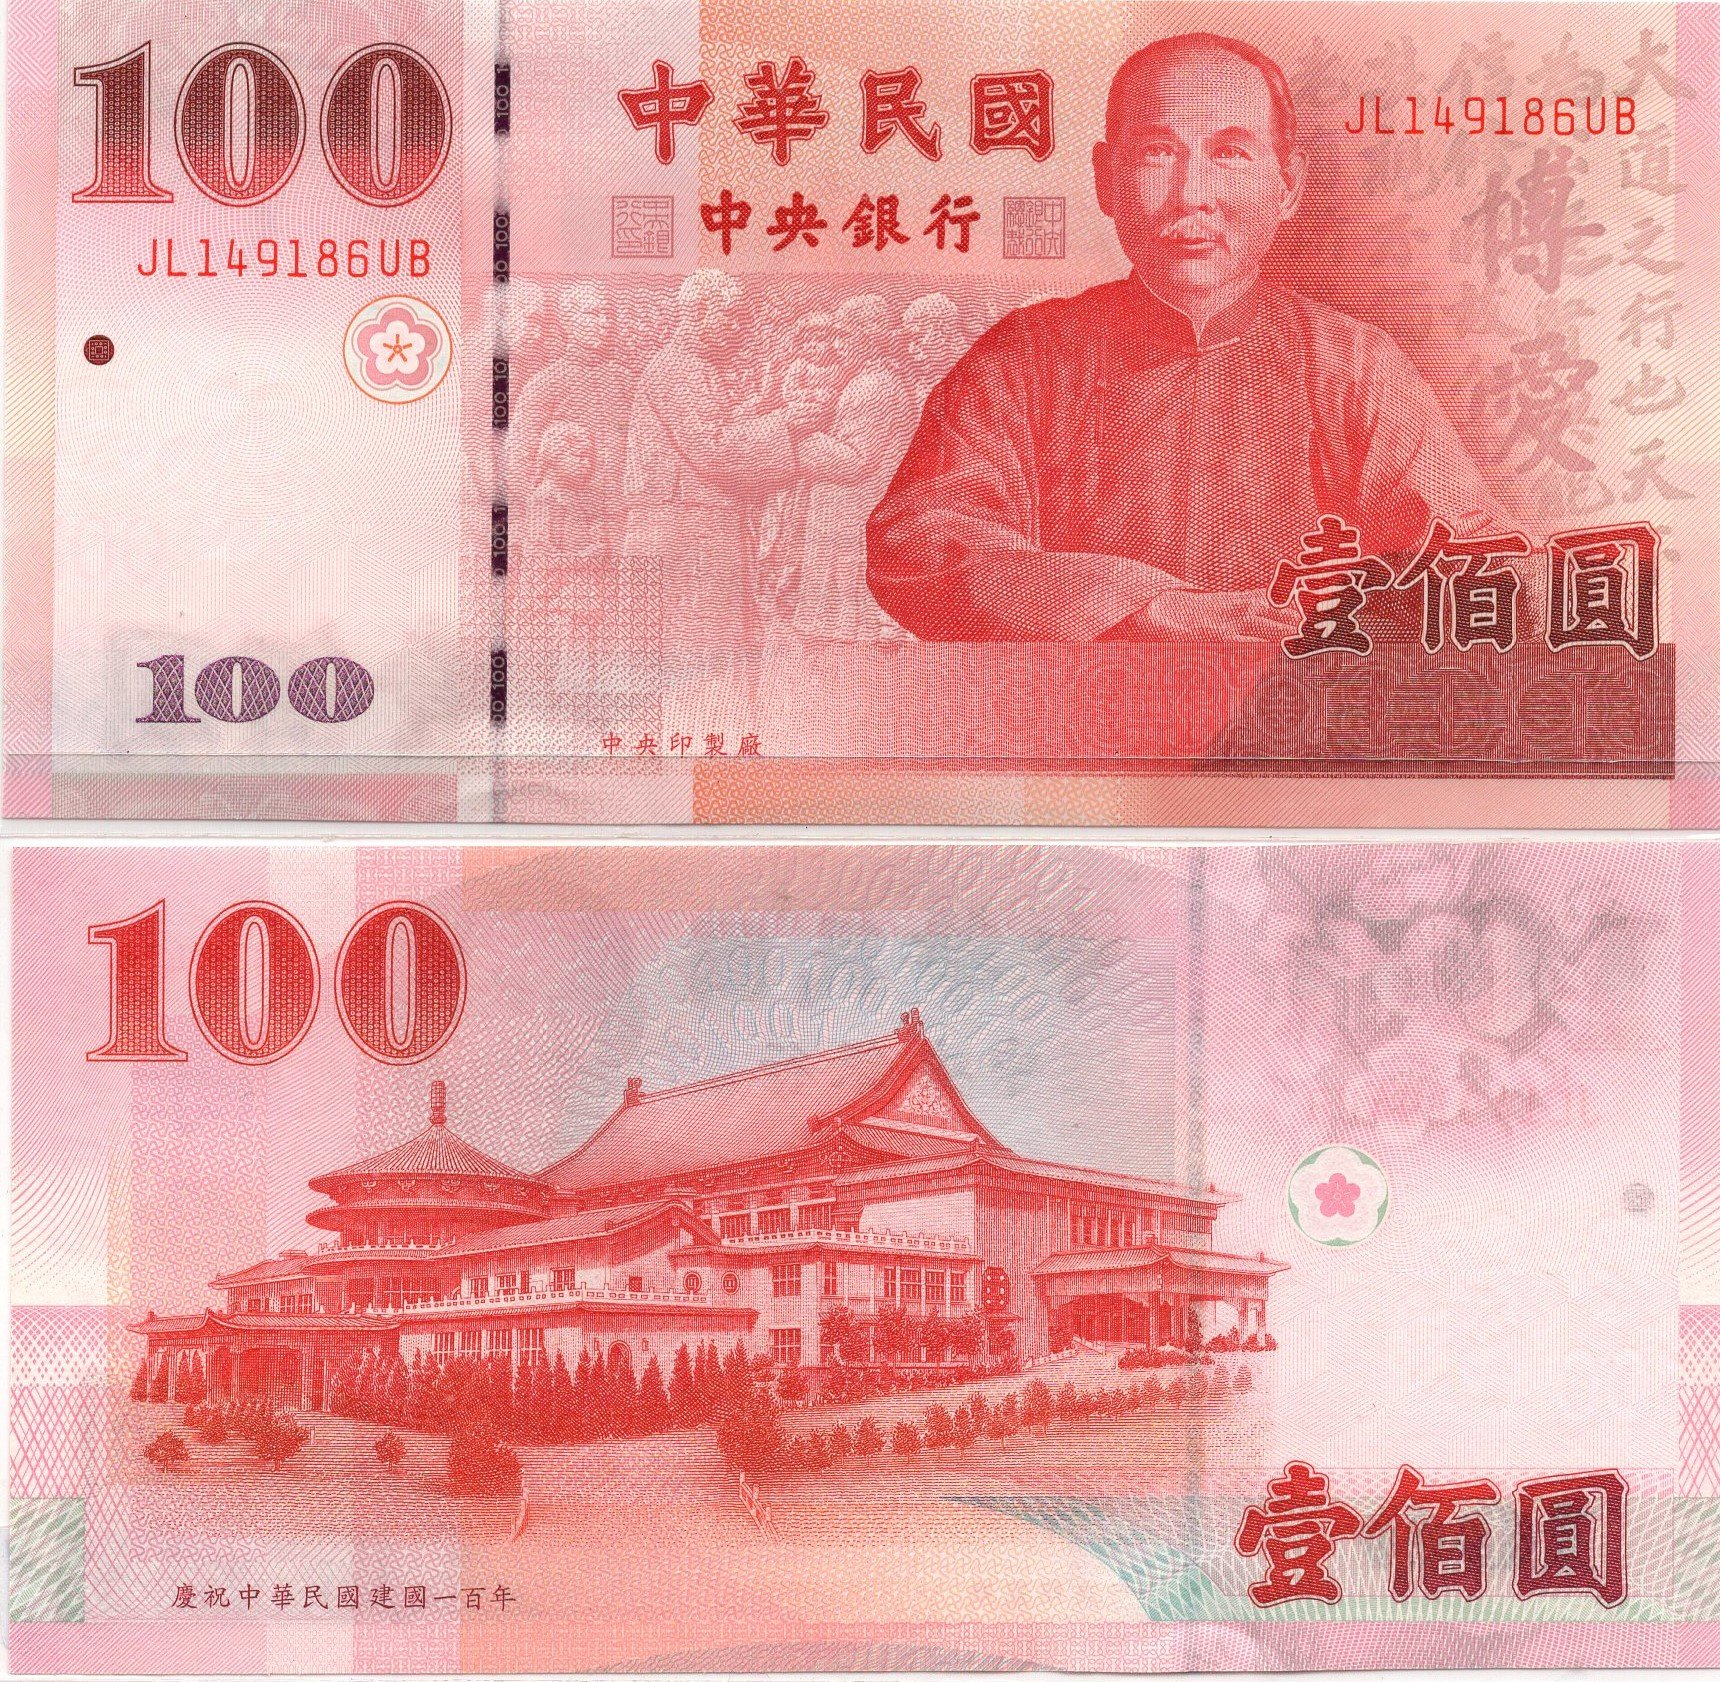 Taiwan 100 yuan